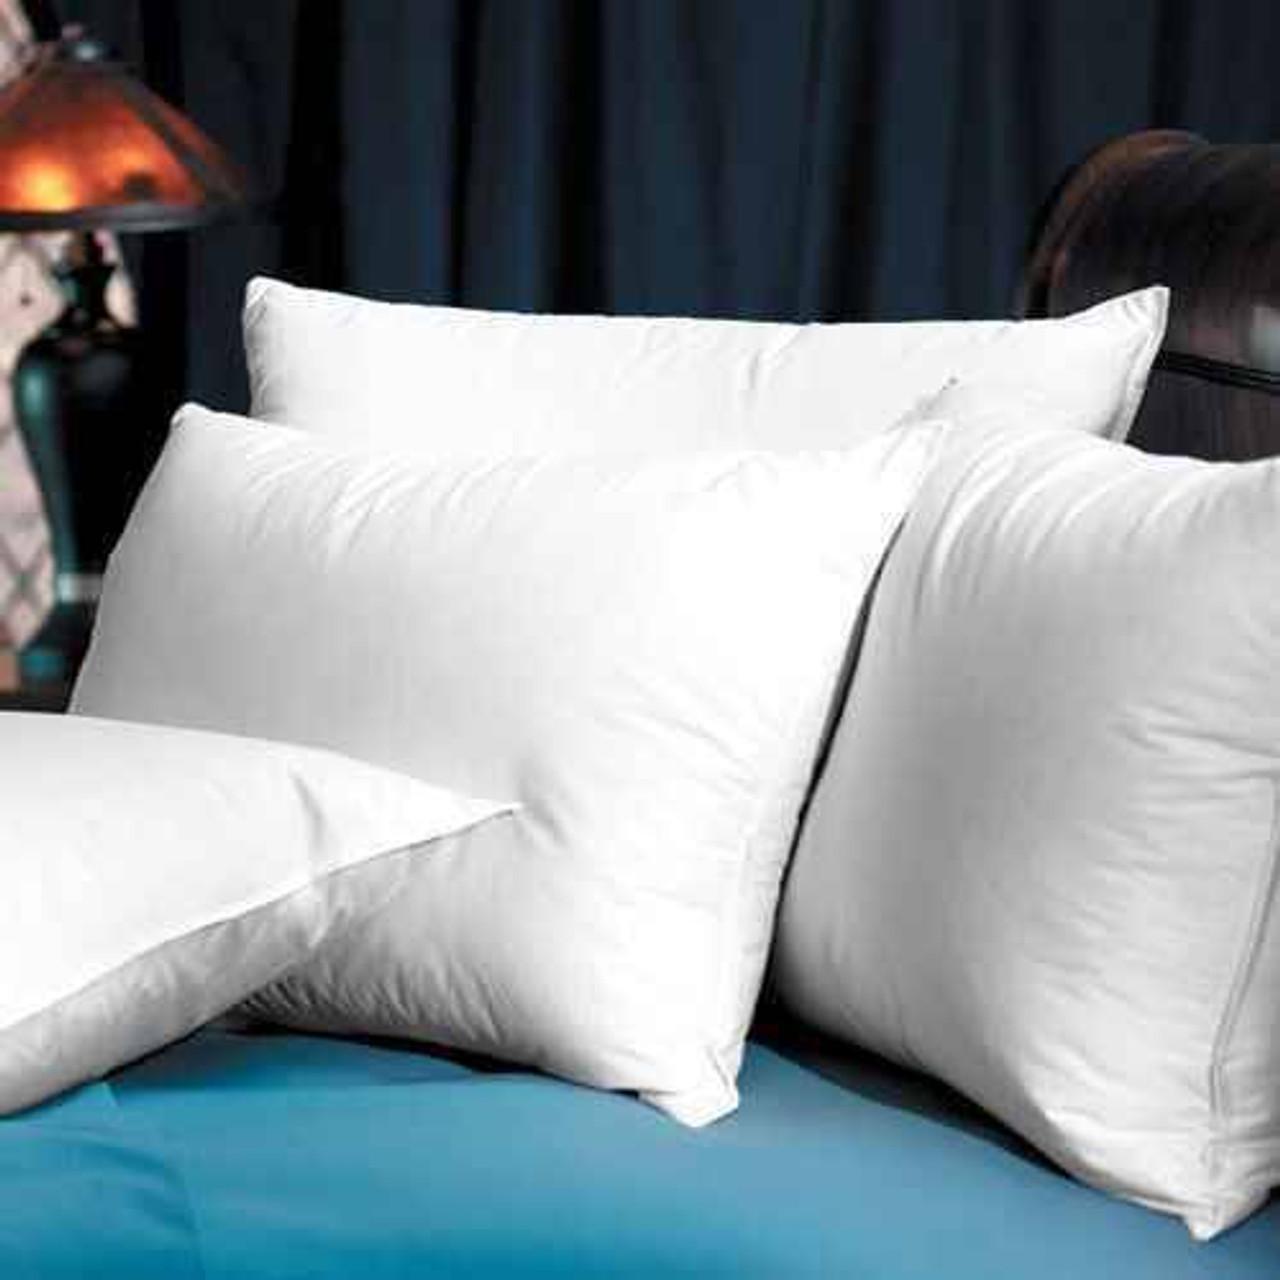 phoenix down pillows athens 25 75 down feather